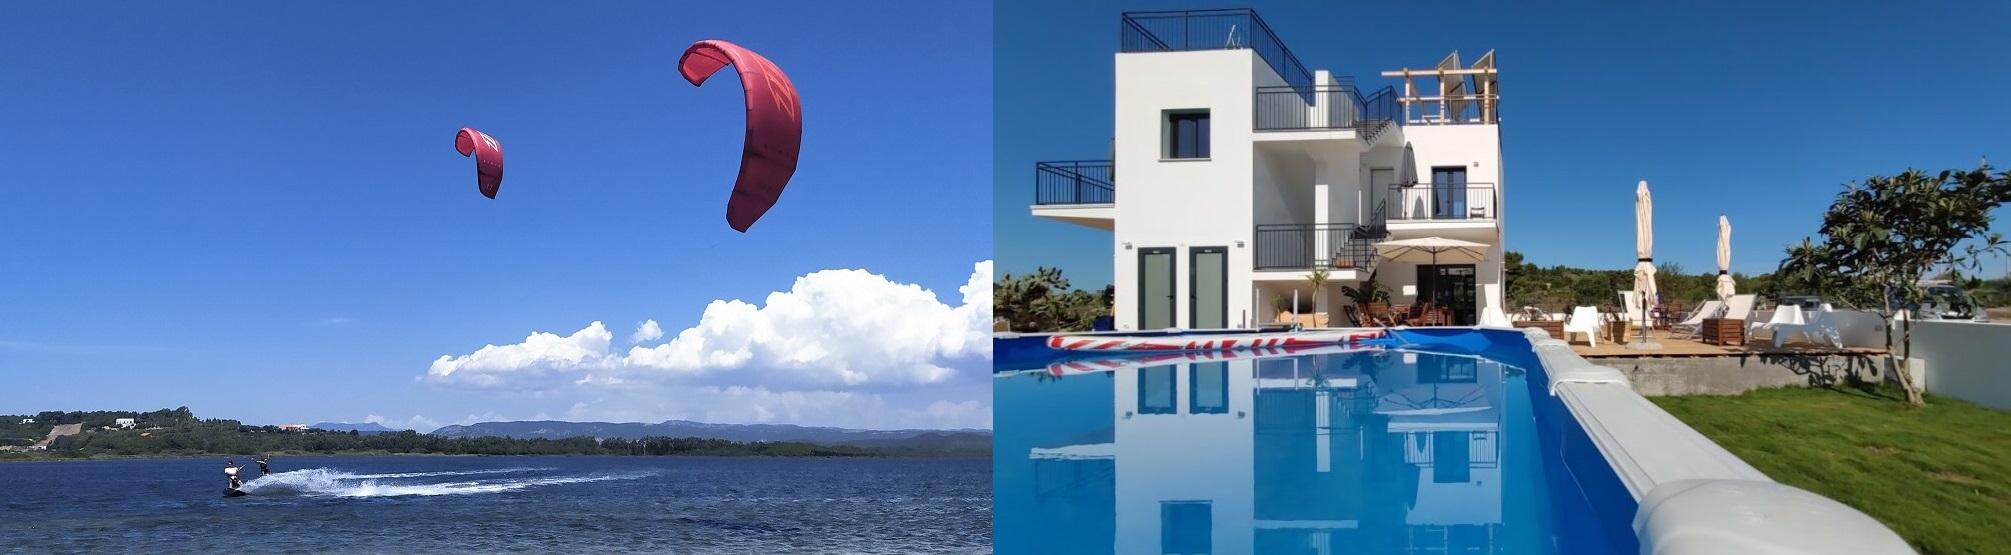 Kite Rental and Accommodation in Punta Trettu, the best Kite Spot